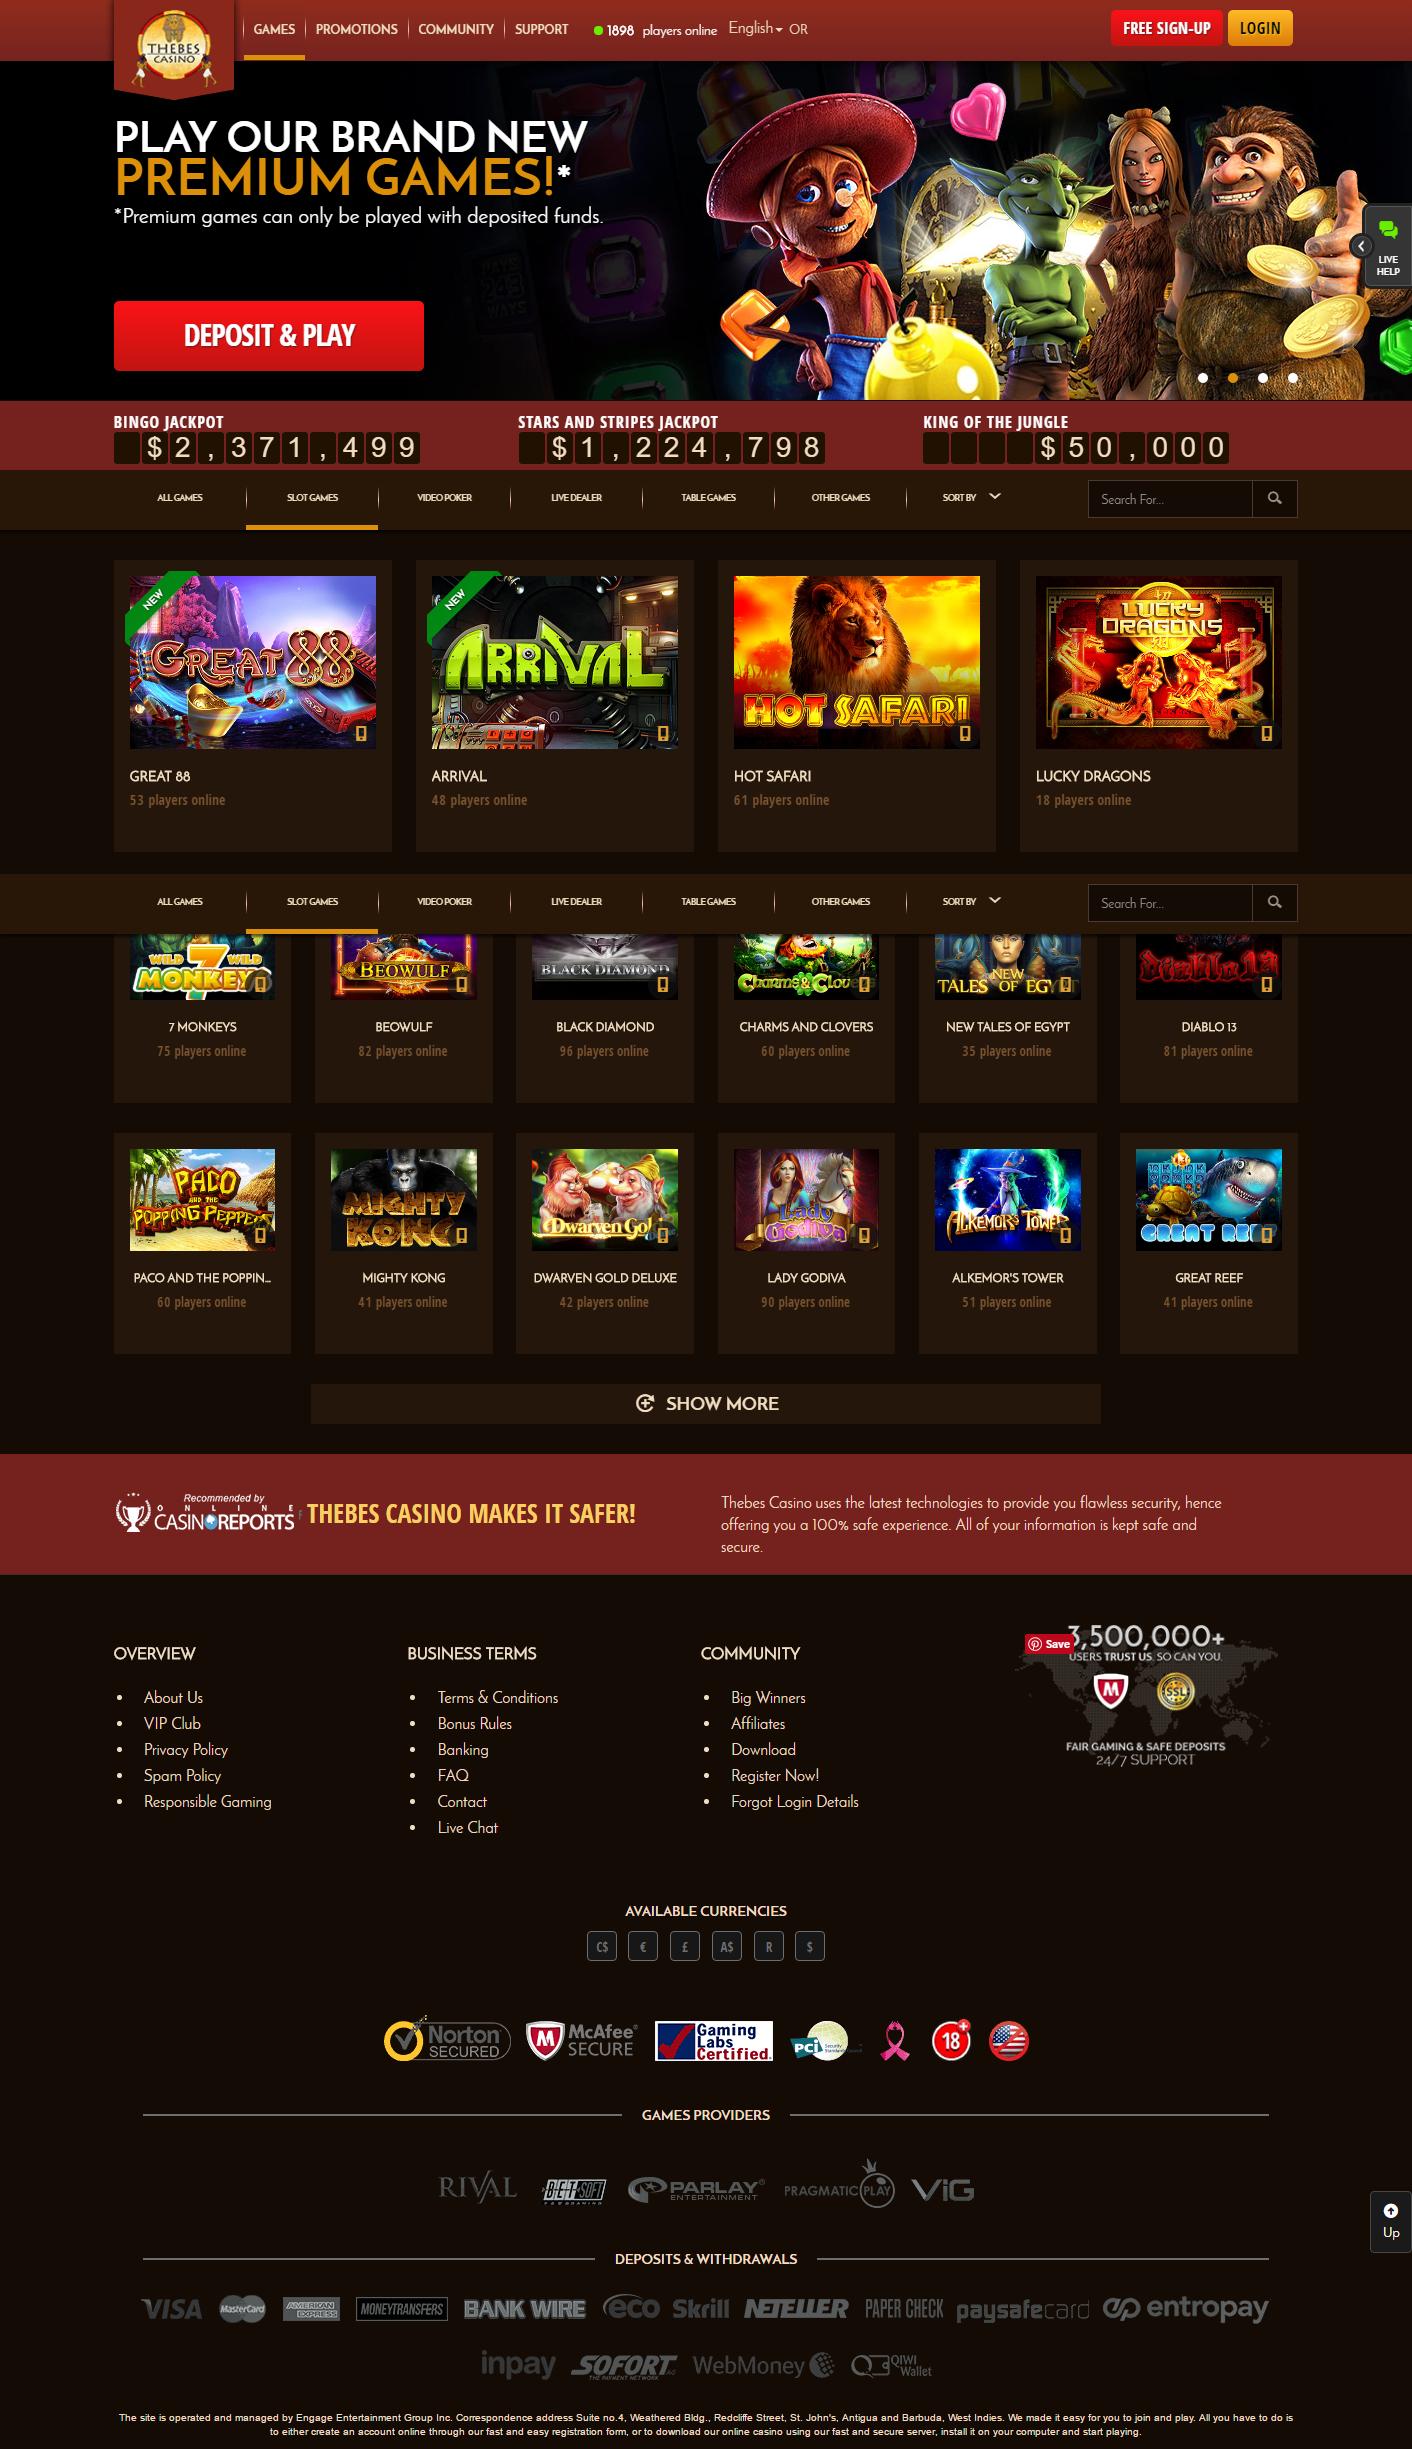 Песня из казино онлайн casino royale online watch free